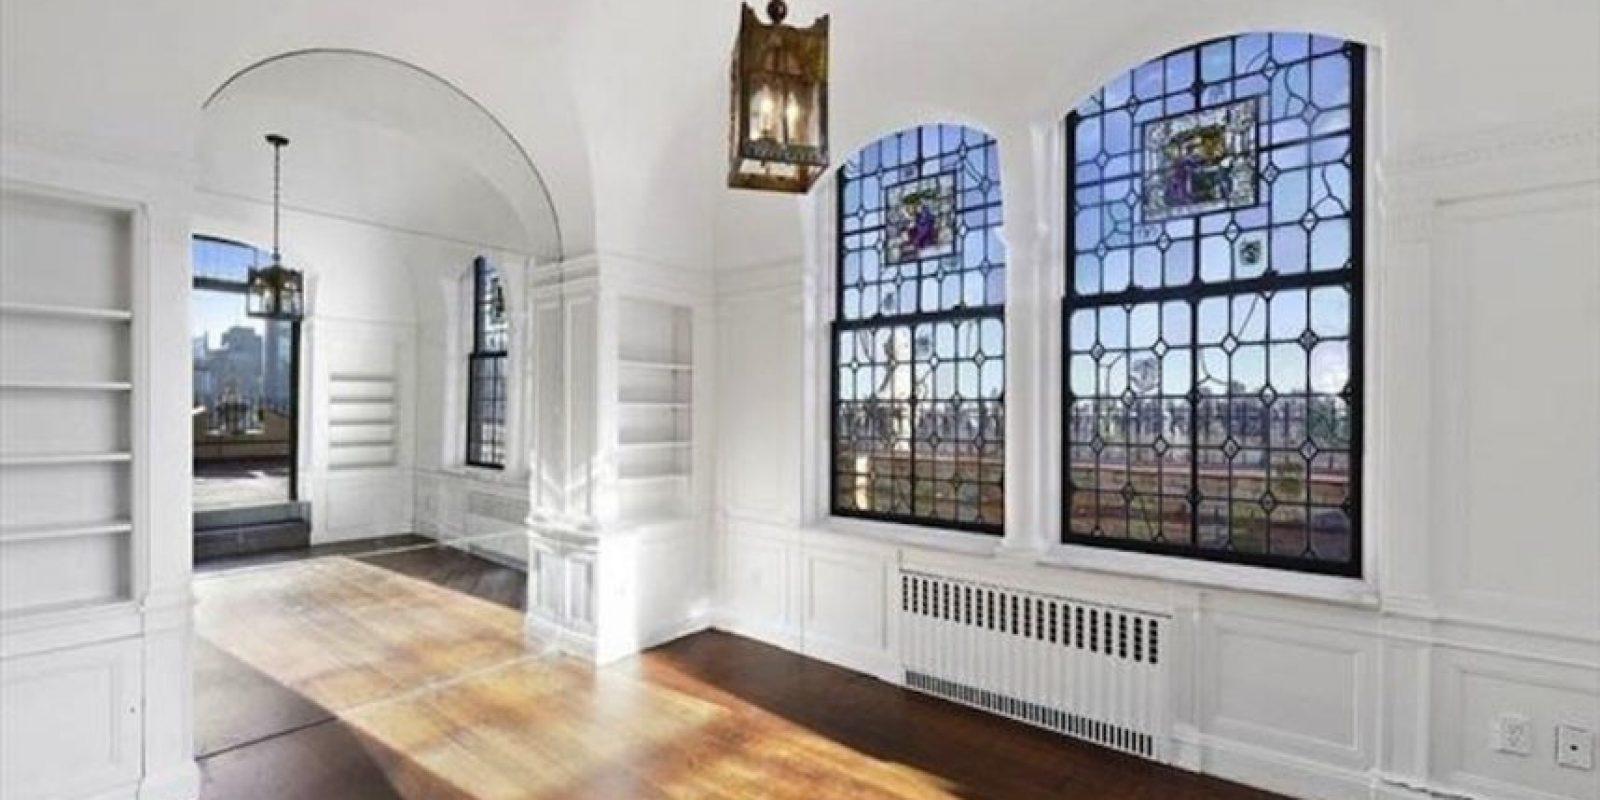 La sala de fiestas. Foto:corcoran.com